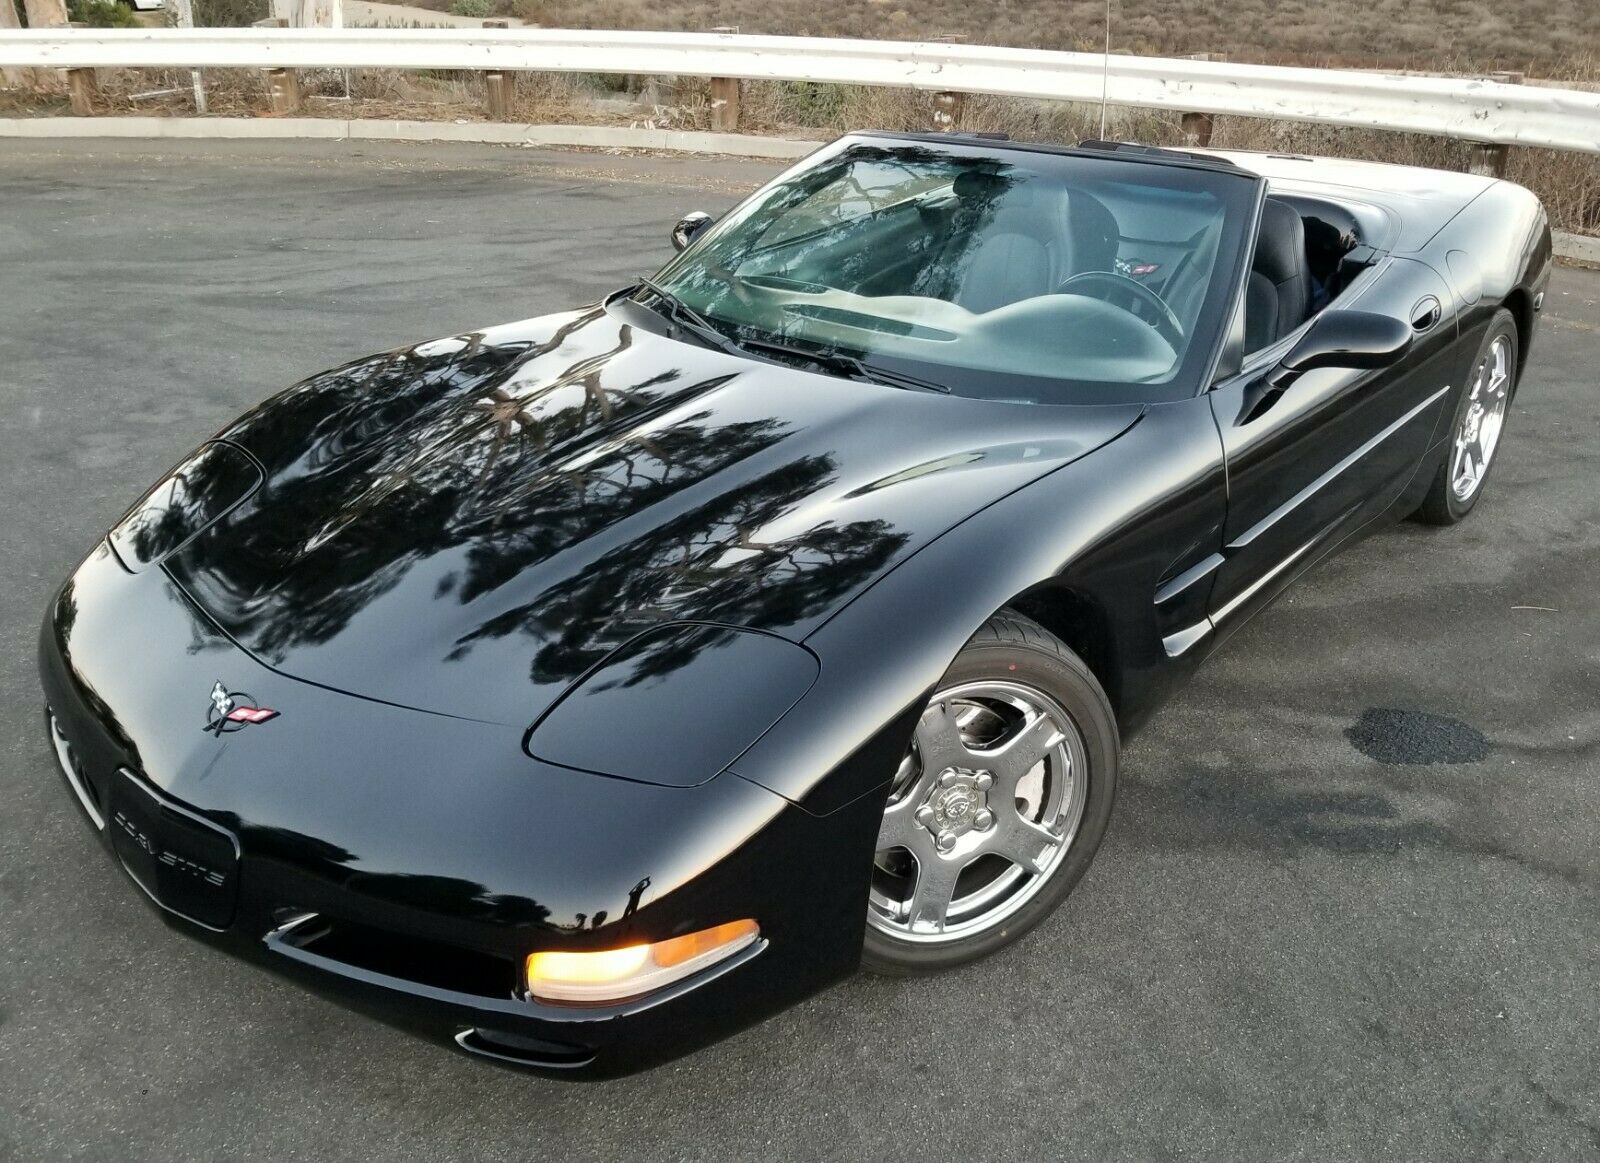 1998 Black Chevrolet Corvette   | C5 Corvette Photo 1